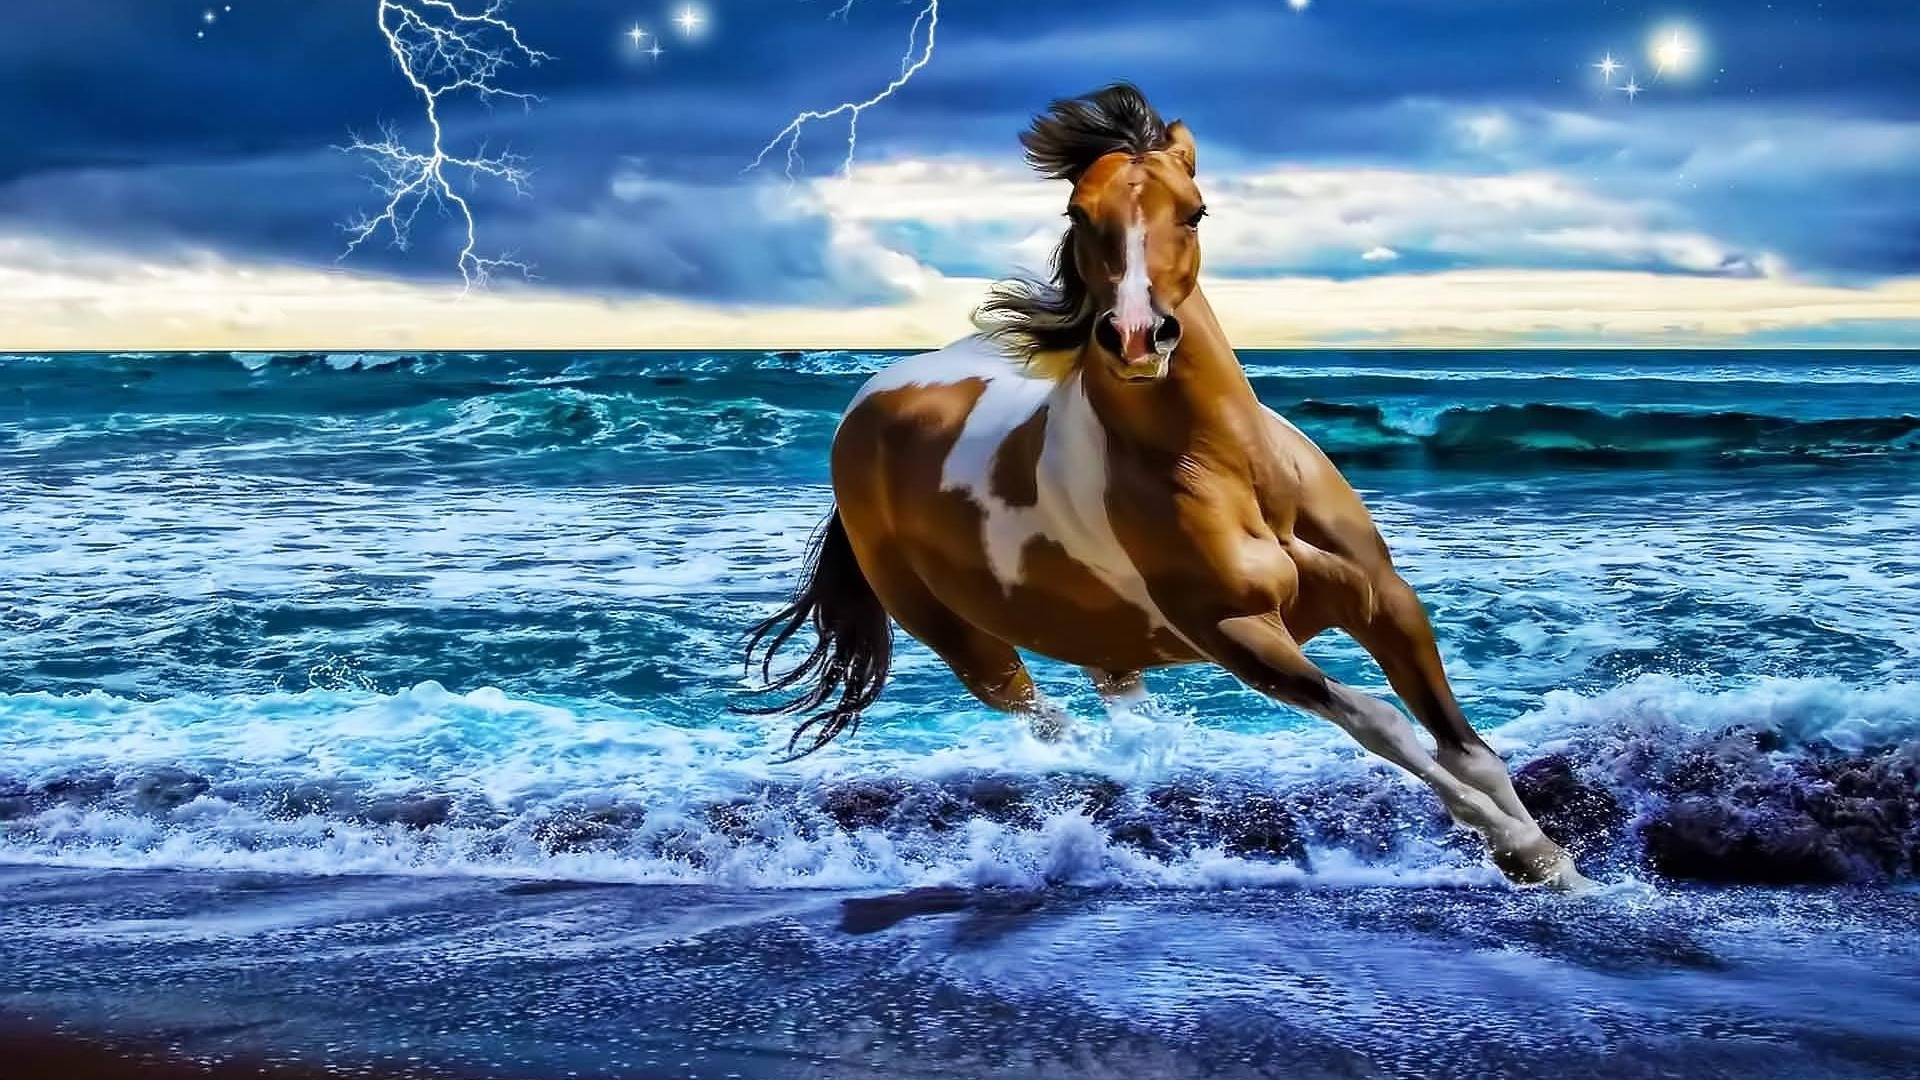 Horses On The Beach Wallpaper Wallpapersafari